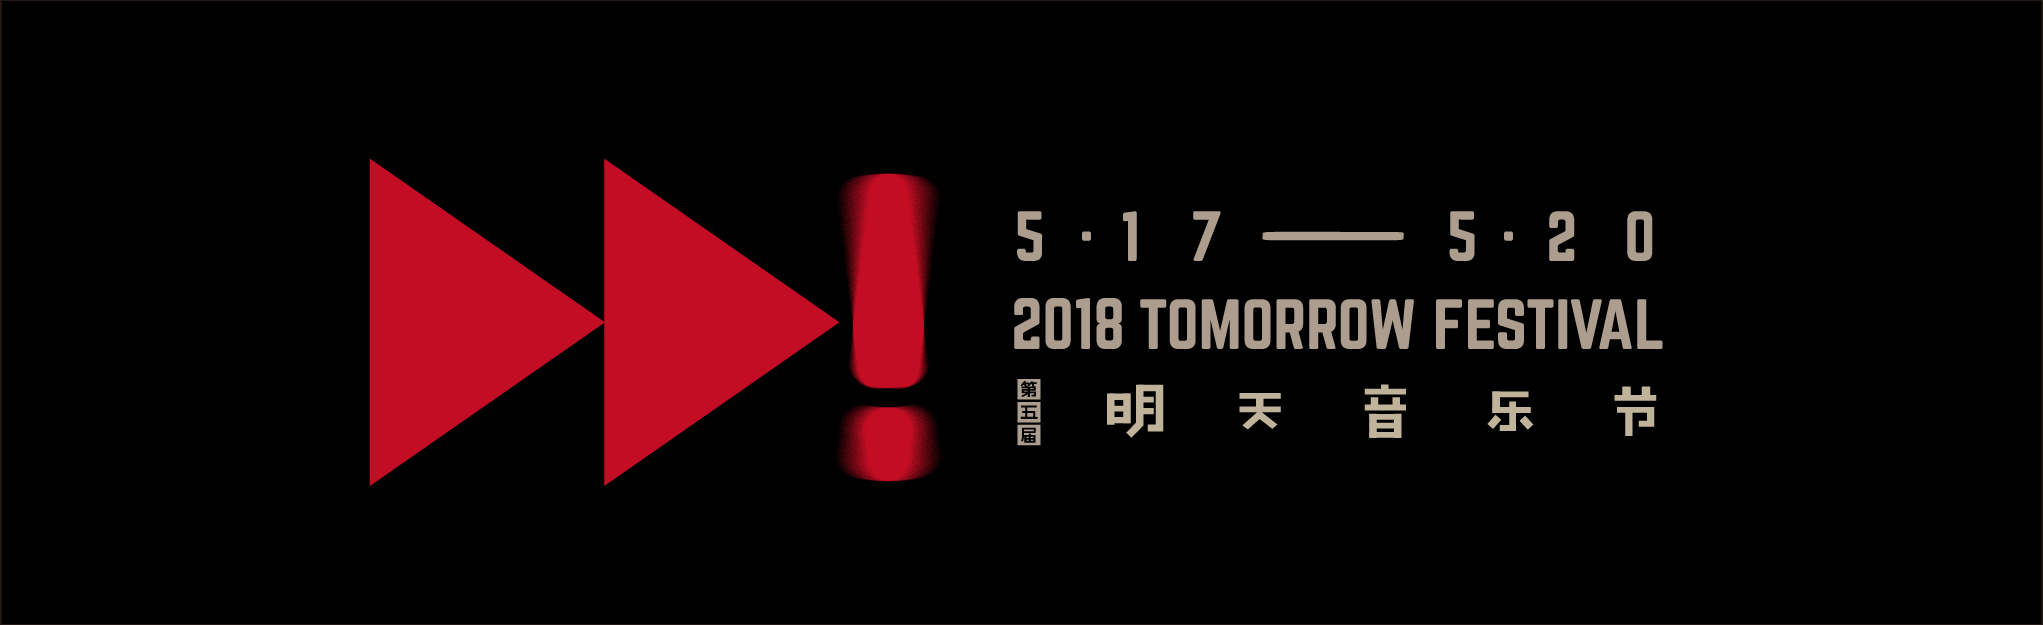 2018TMR-website_形象.jpg